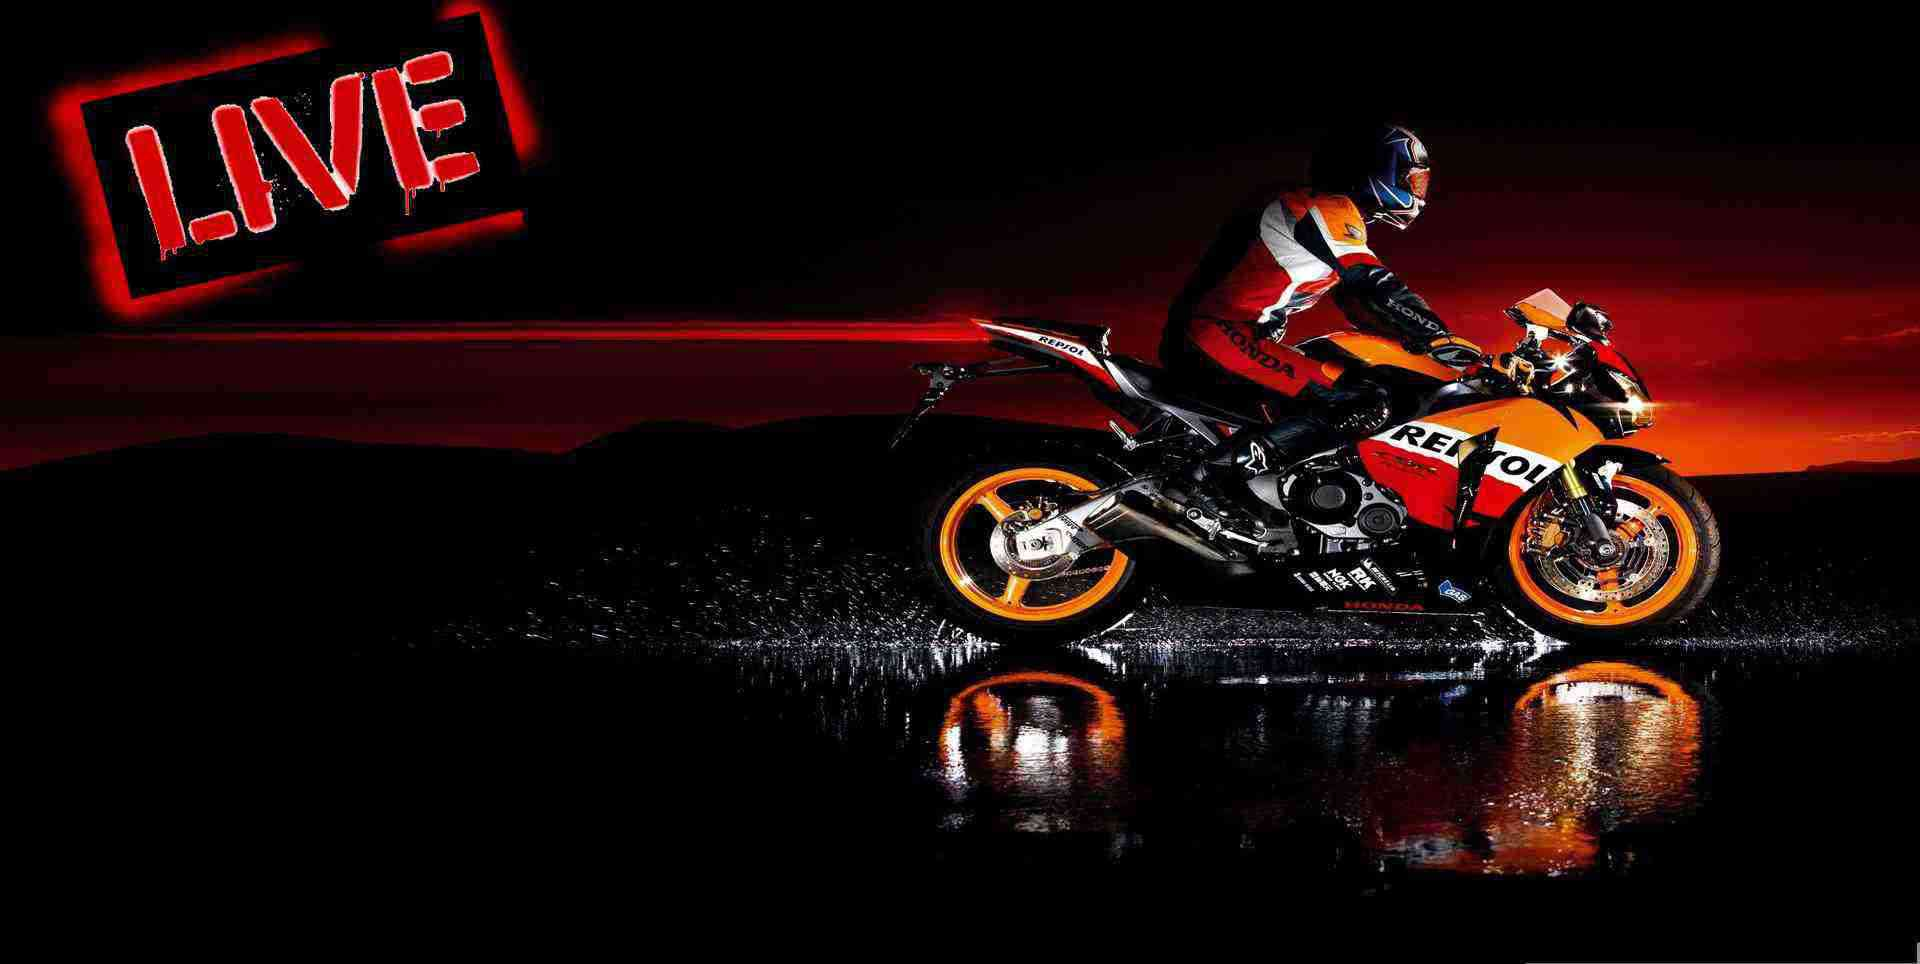 watch-2014-argentine-motorcycle-grand-prix-live